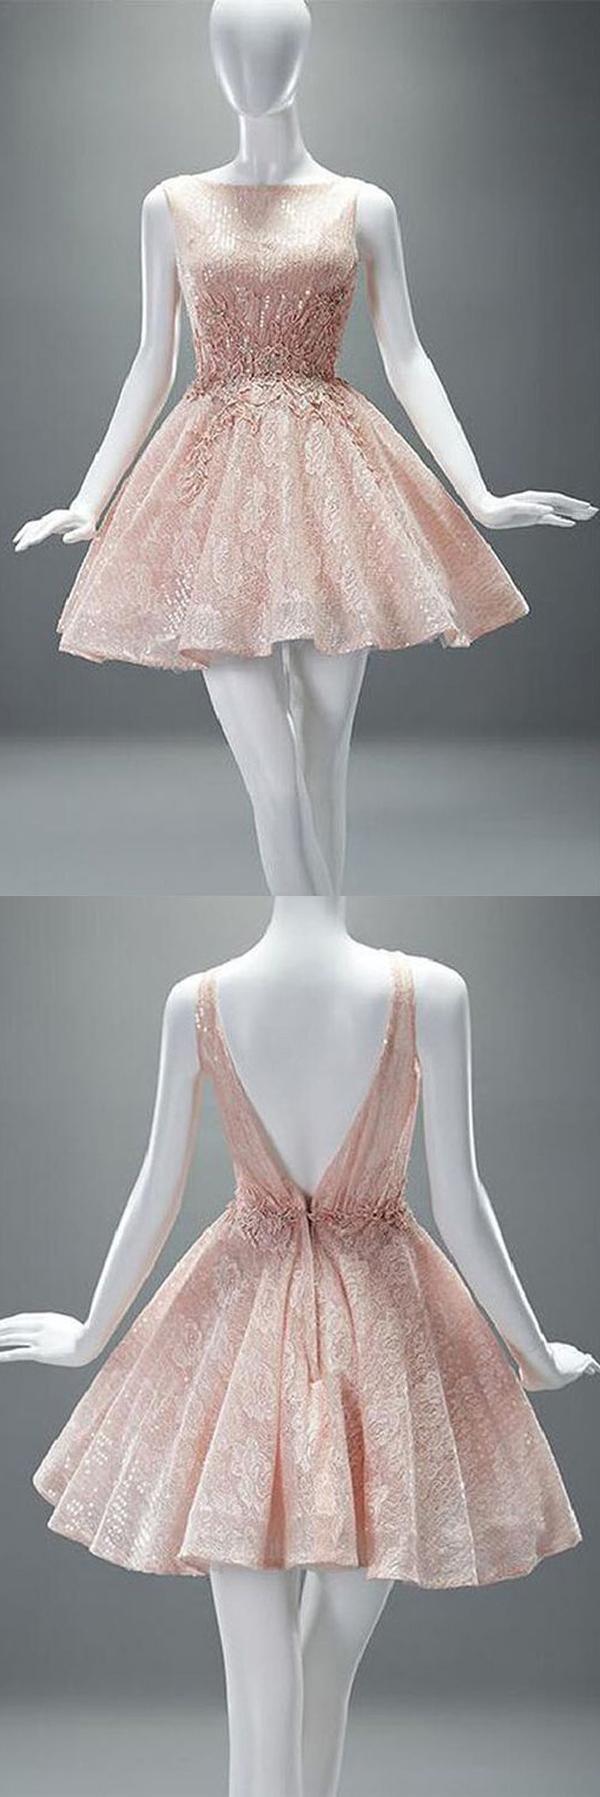 Pink boat homecoming dressessleeveless v back appliques puff short